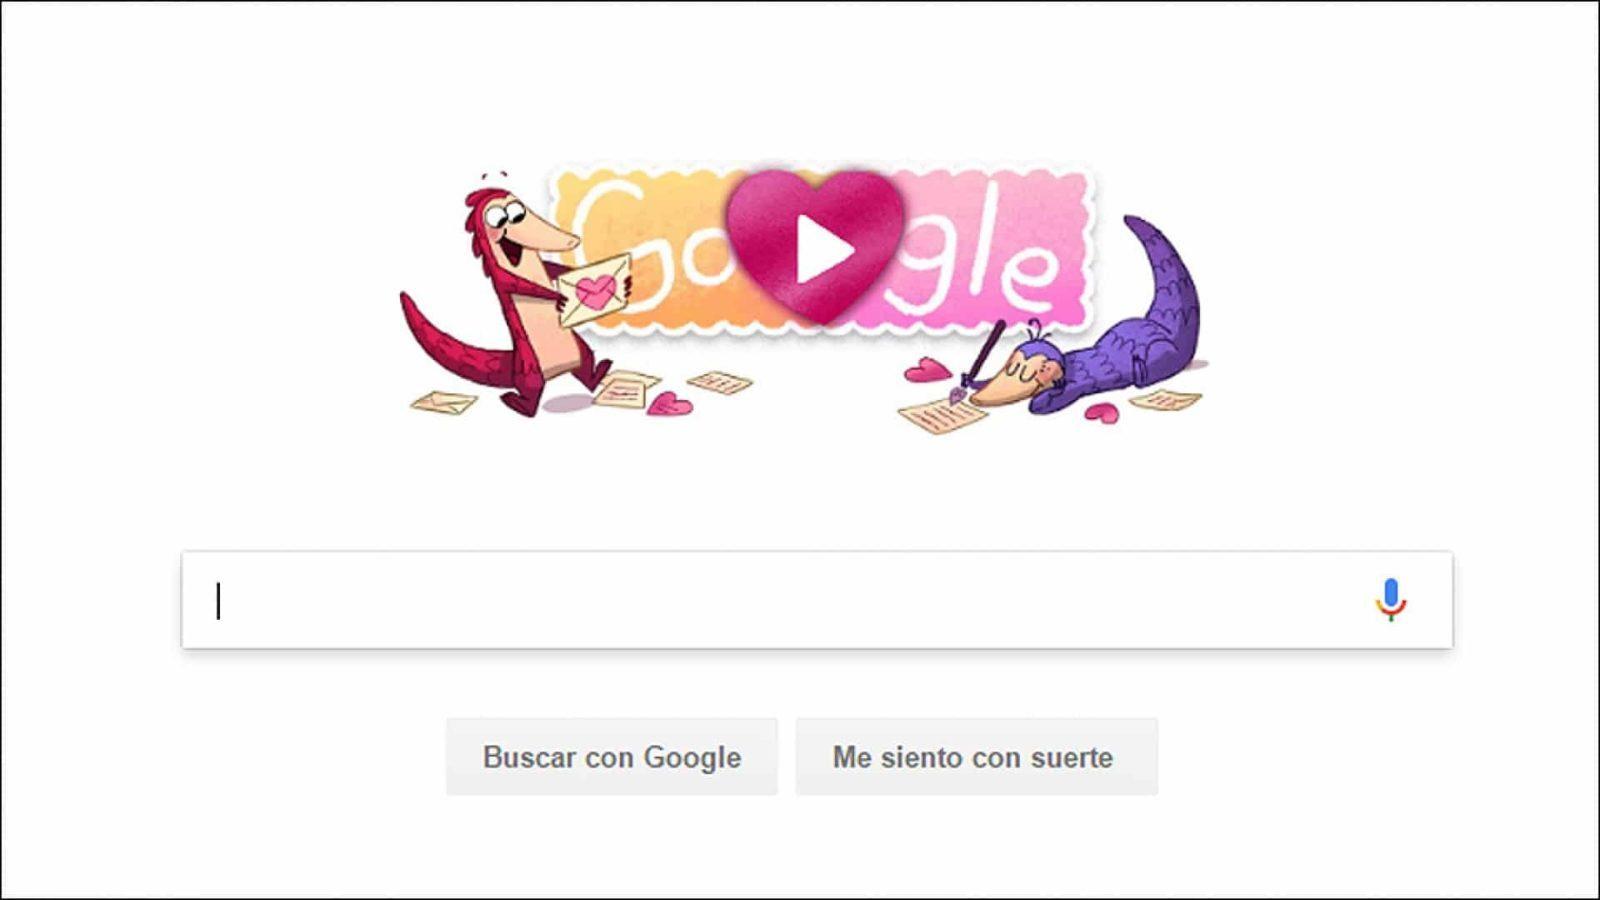 Sirope-Historias-Articulos-Opinion-web rentable-google amor